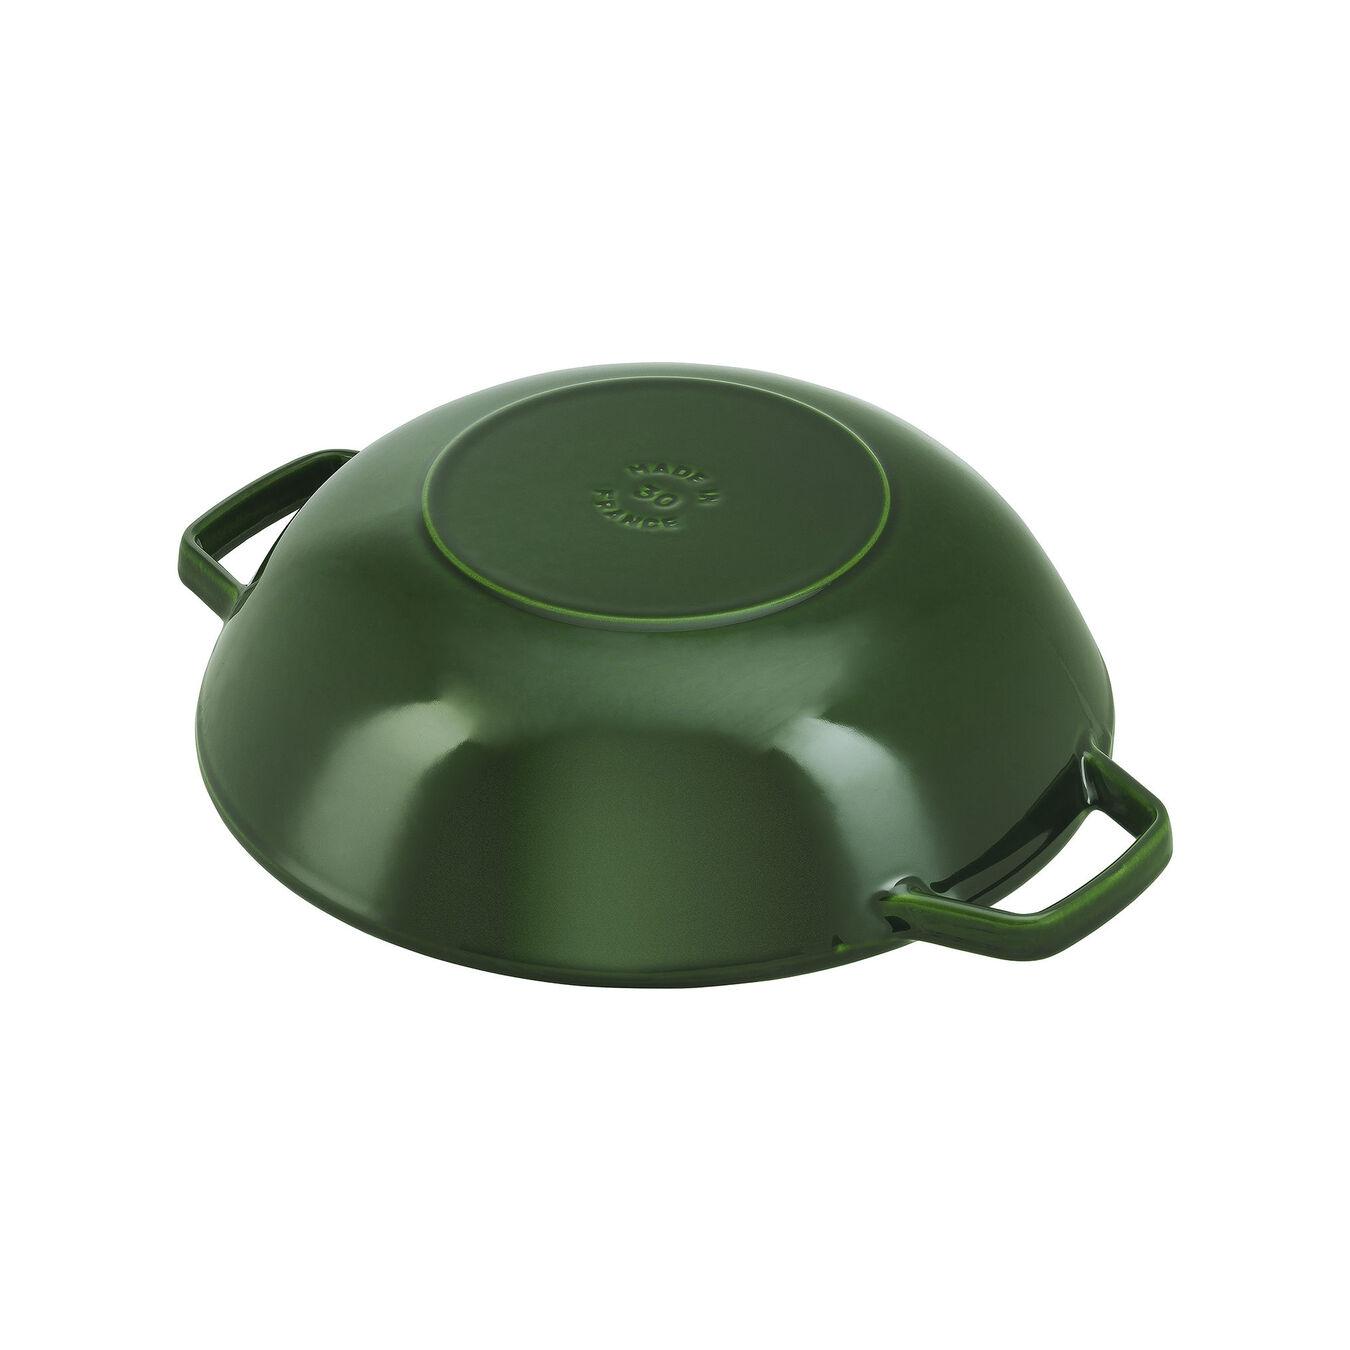 4.5-qt Perfect Pan - Basil,,large 3